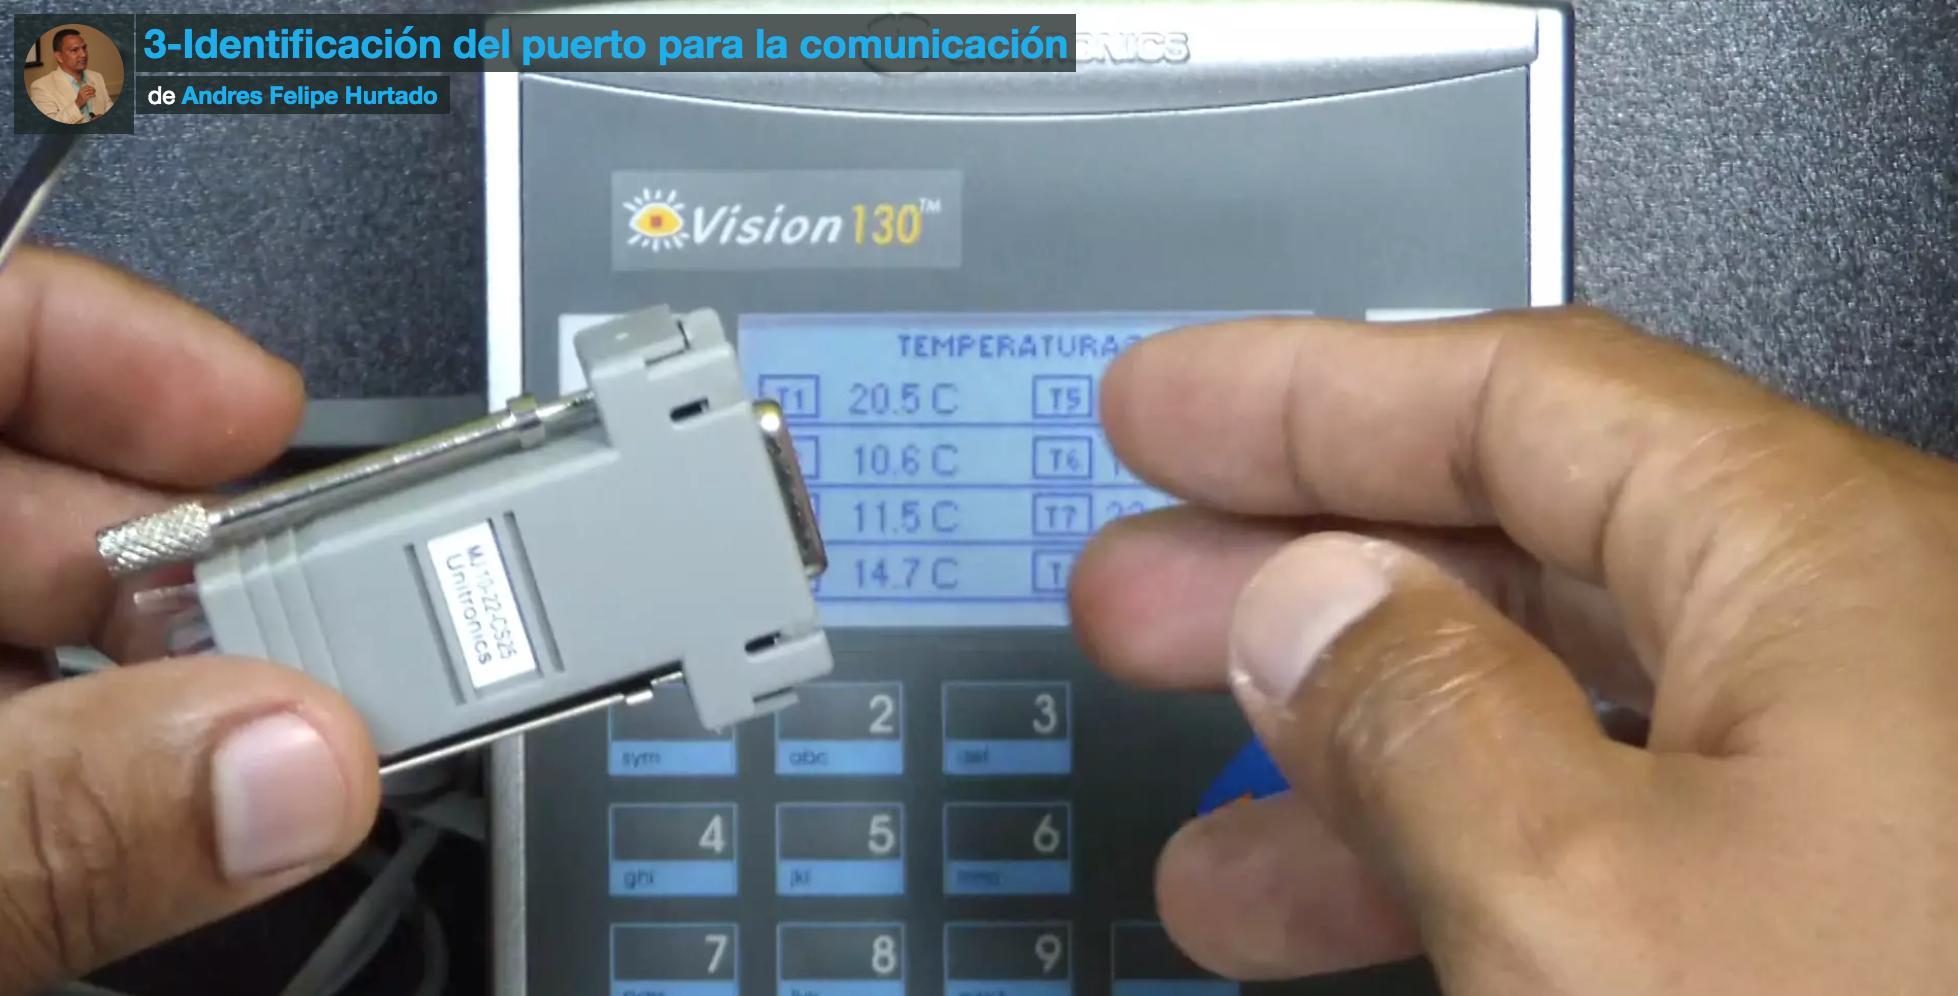 Curso modbus rtu plc vision 130 unitronics